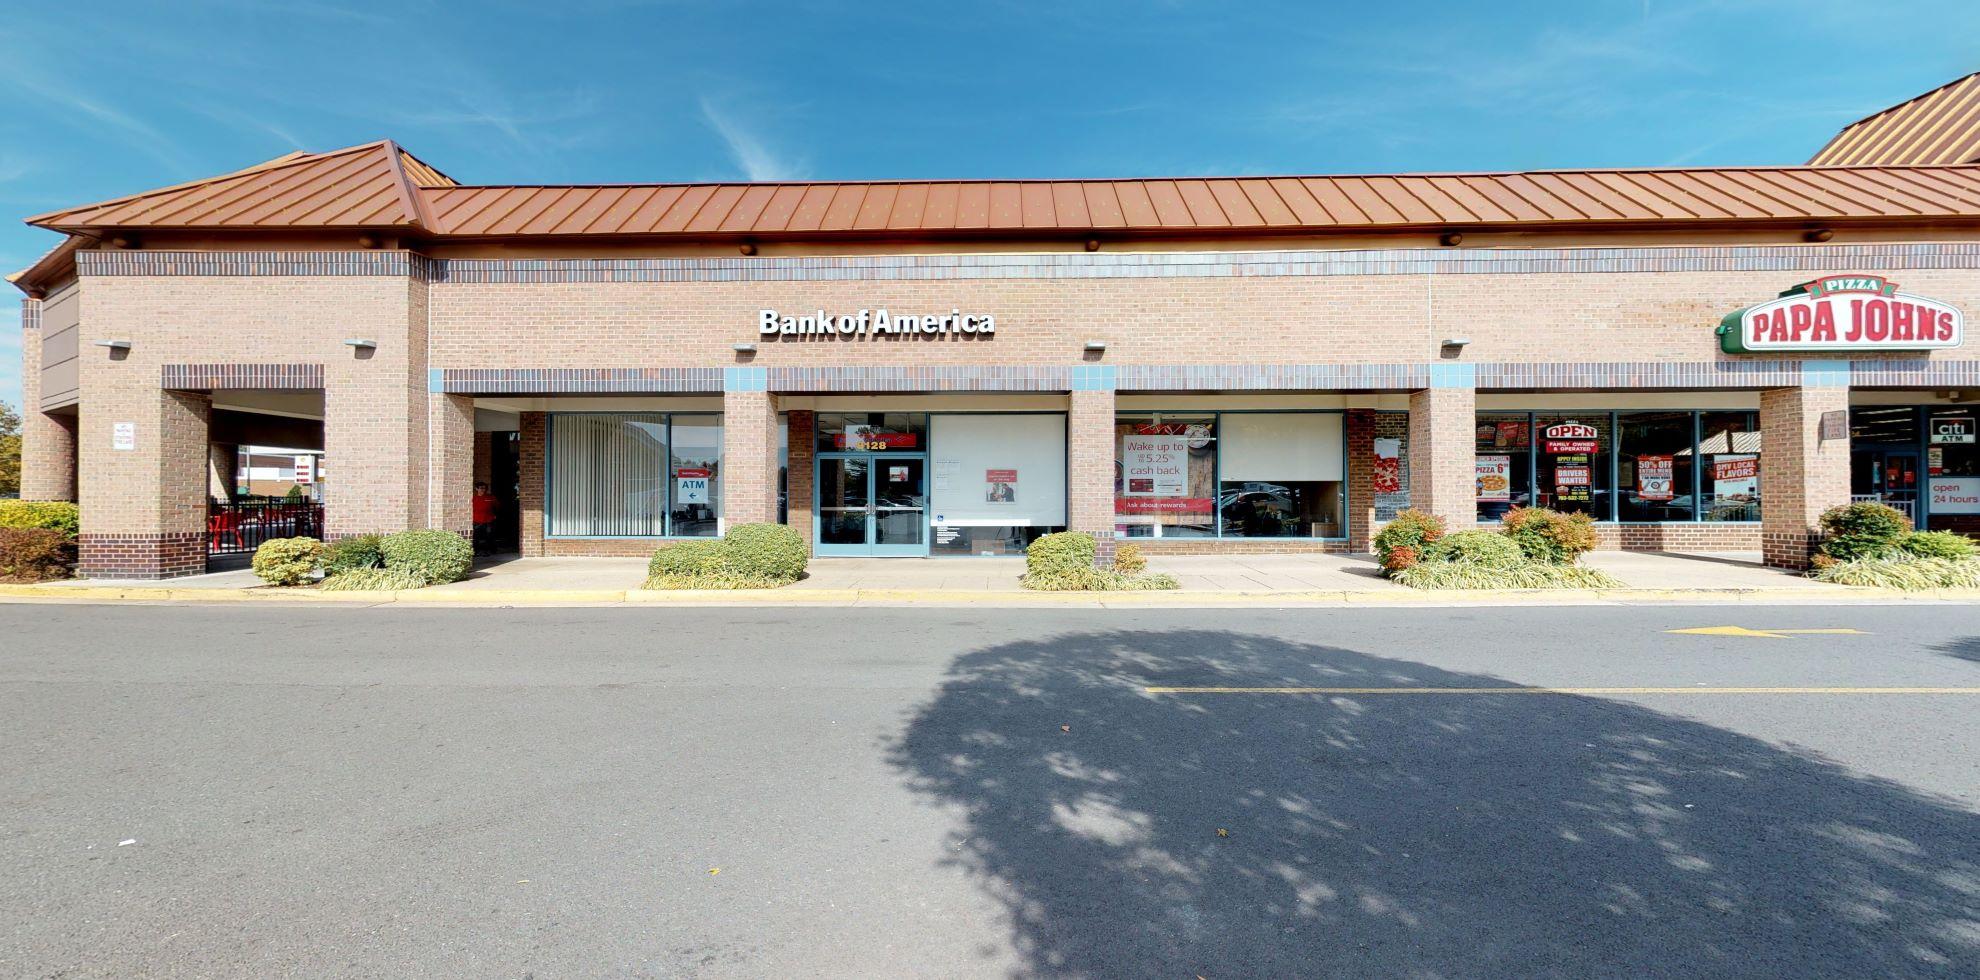 Bank of America financial center with walk-up ATM | 8128 Arlington Blvd, Falls Church, VA 22042